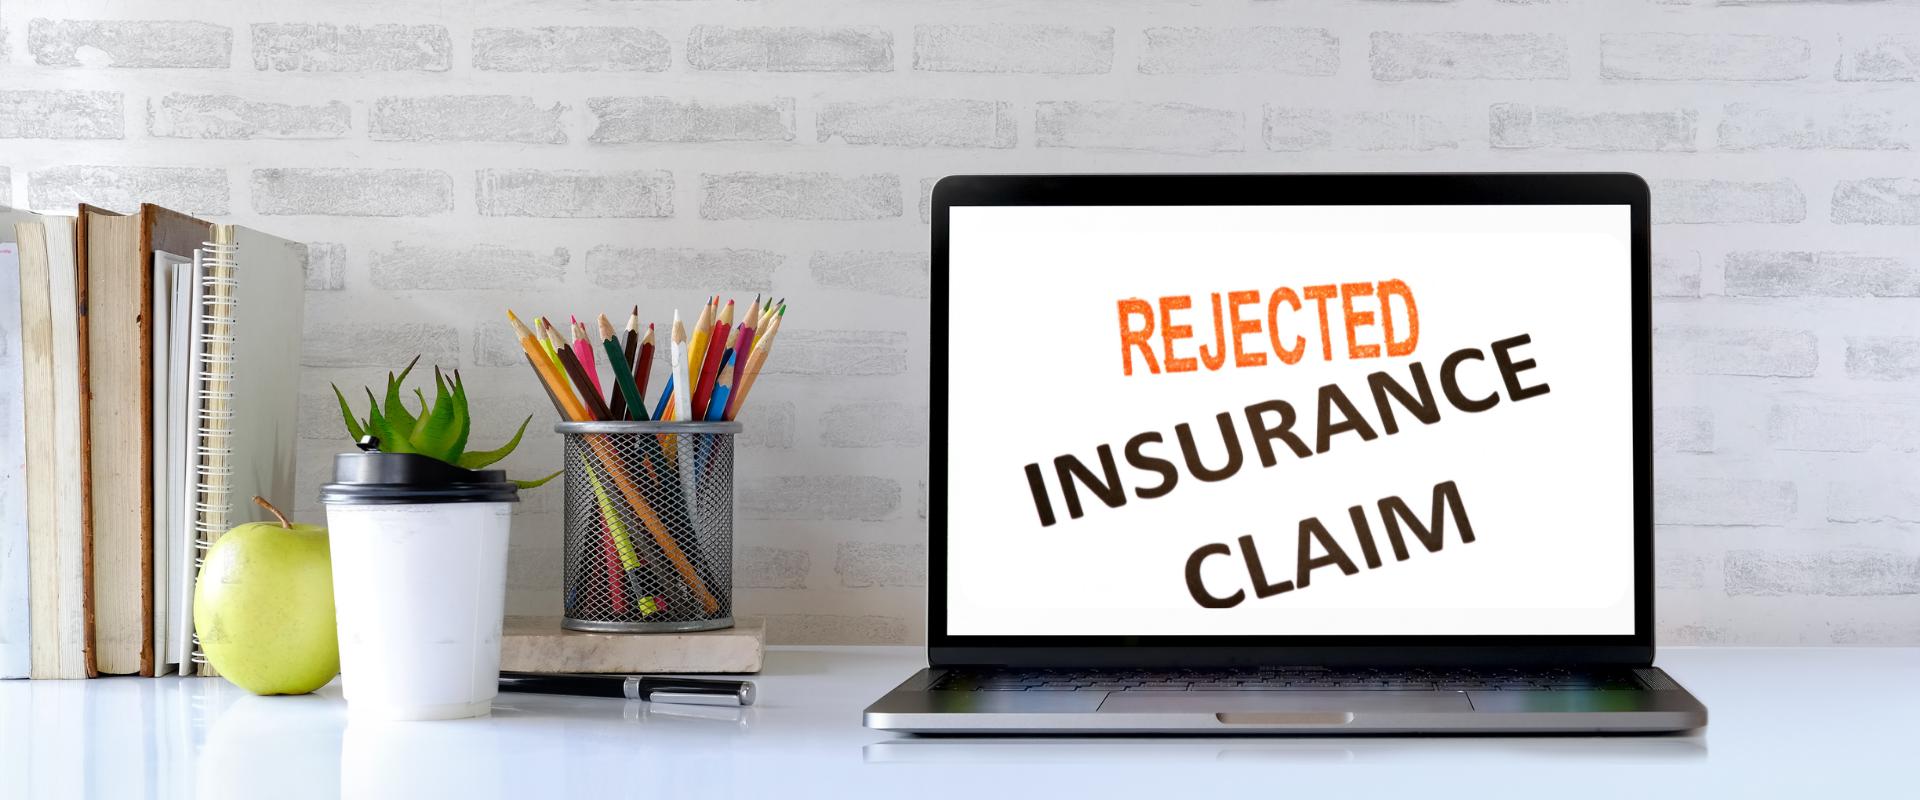 7 Deadly Sins of Insurance Claim Denials